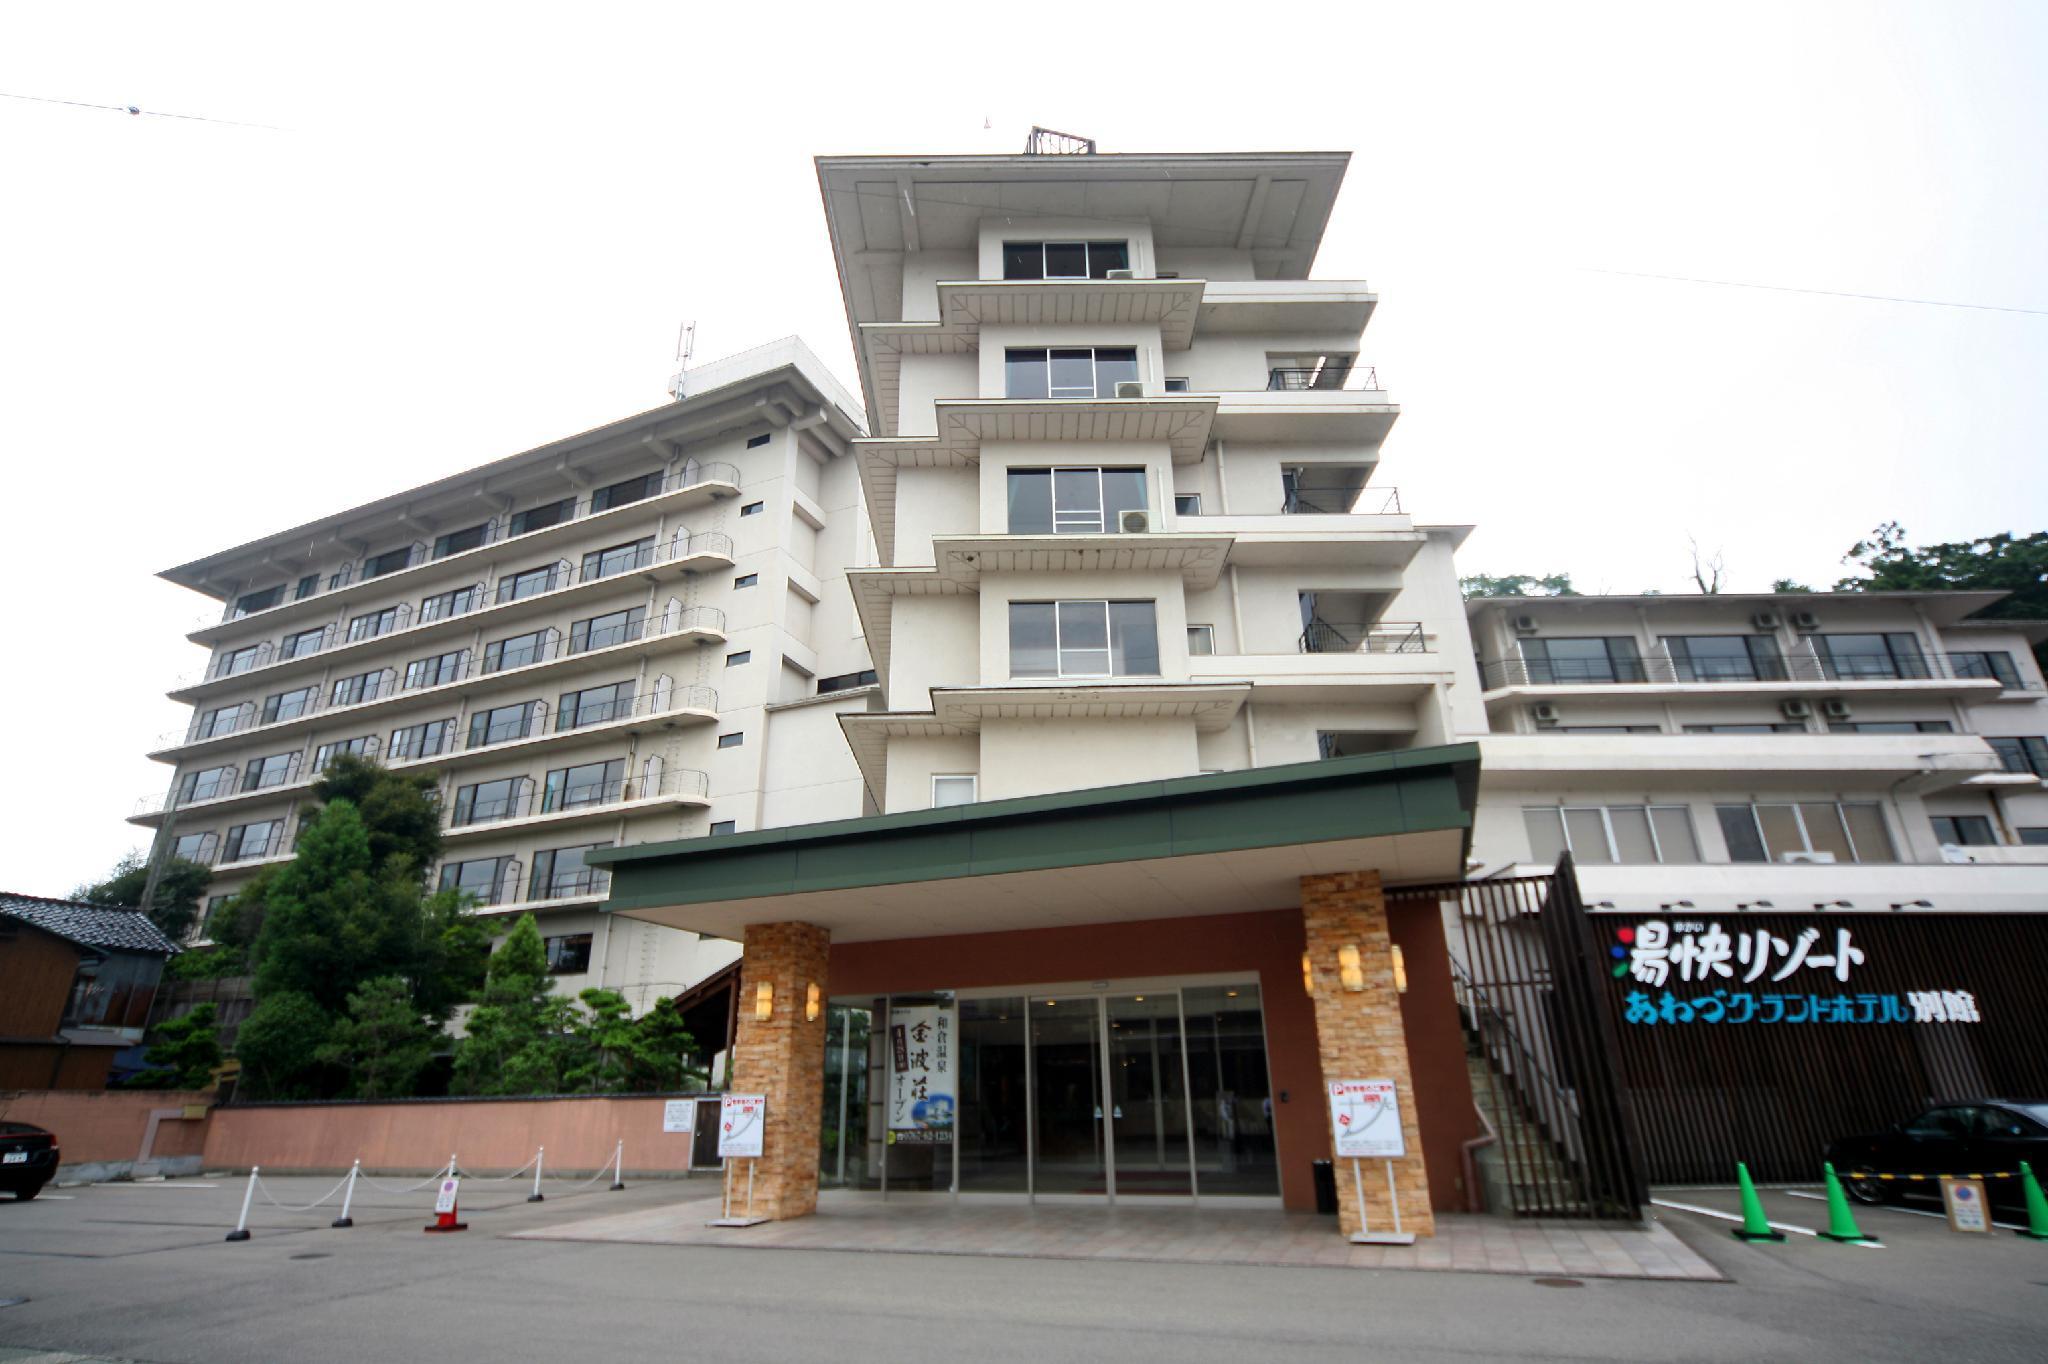 Yukai Resort Awazuonnsen Awazu Grand Hotel Bekkan, Komatsu